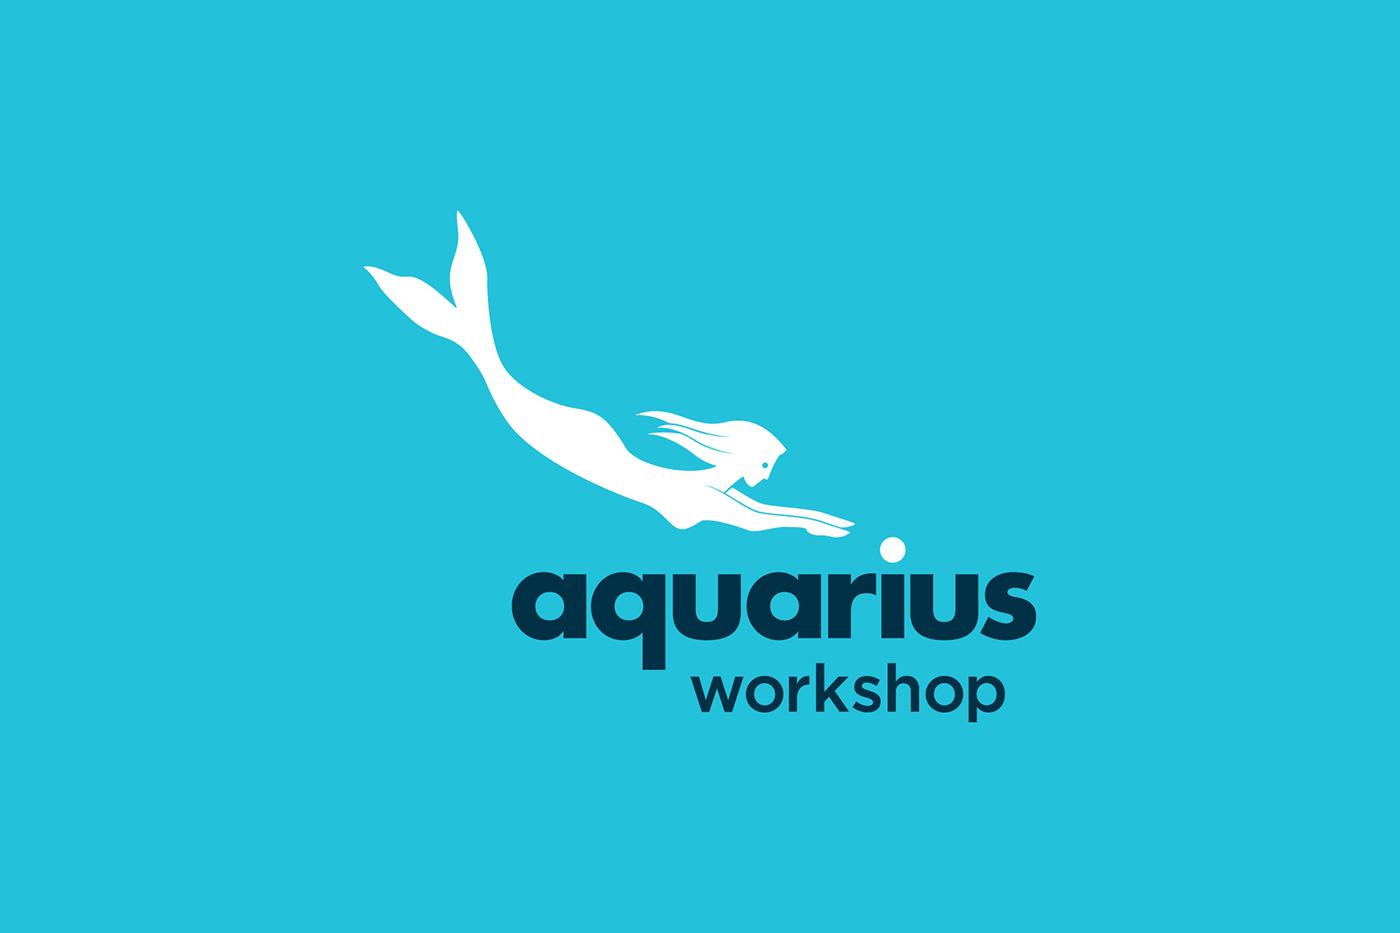 Aquarius Workshop on Student Show